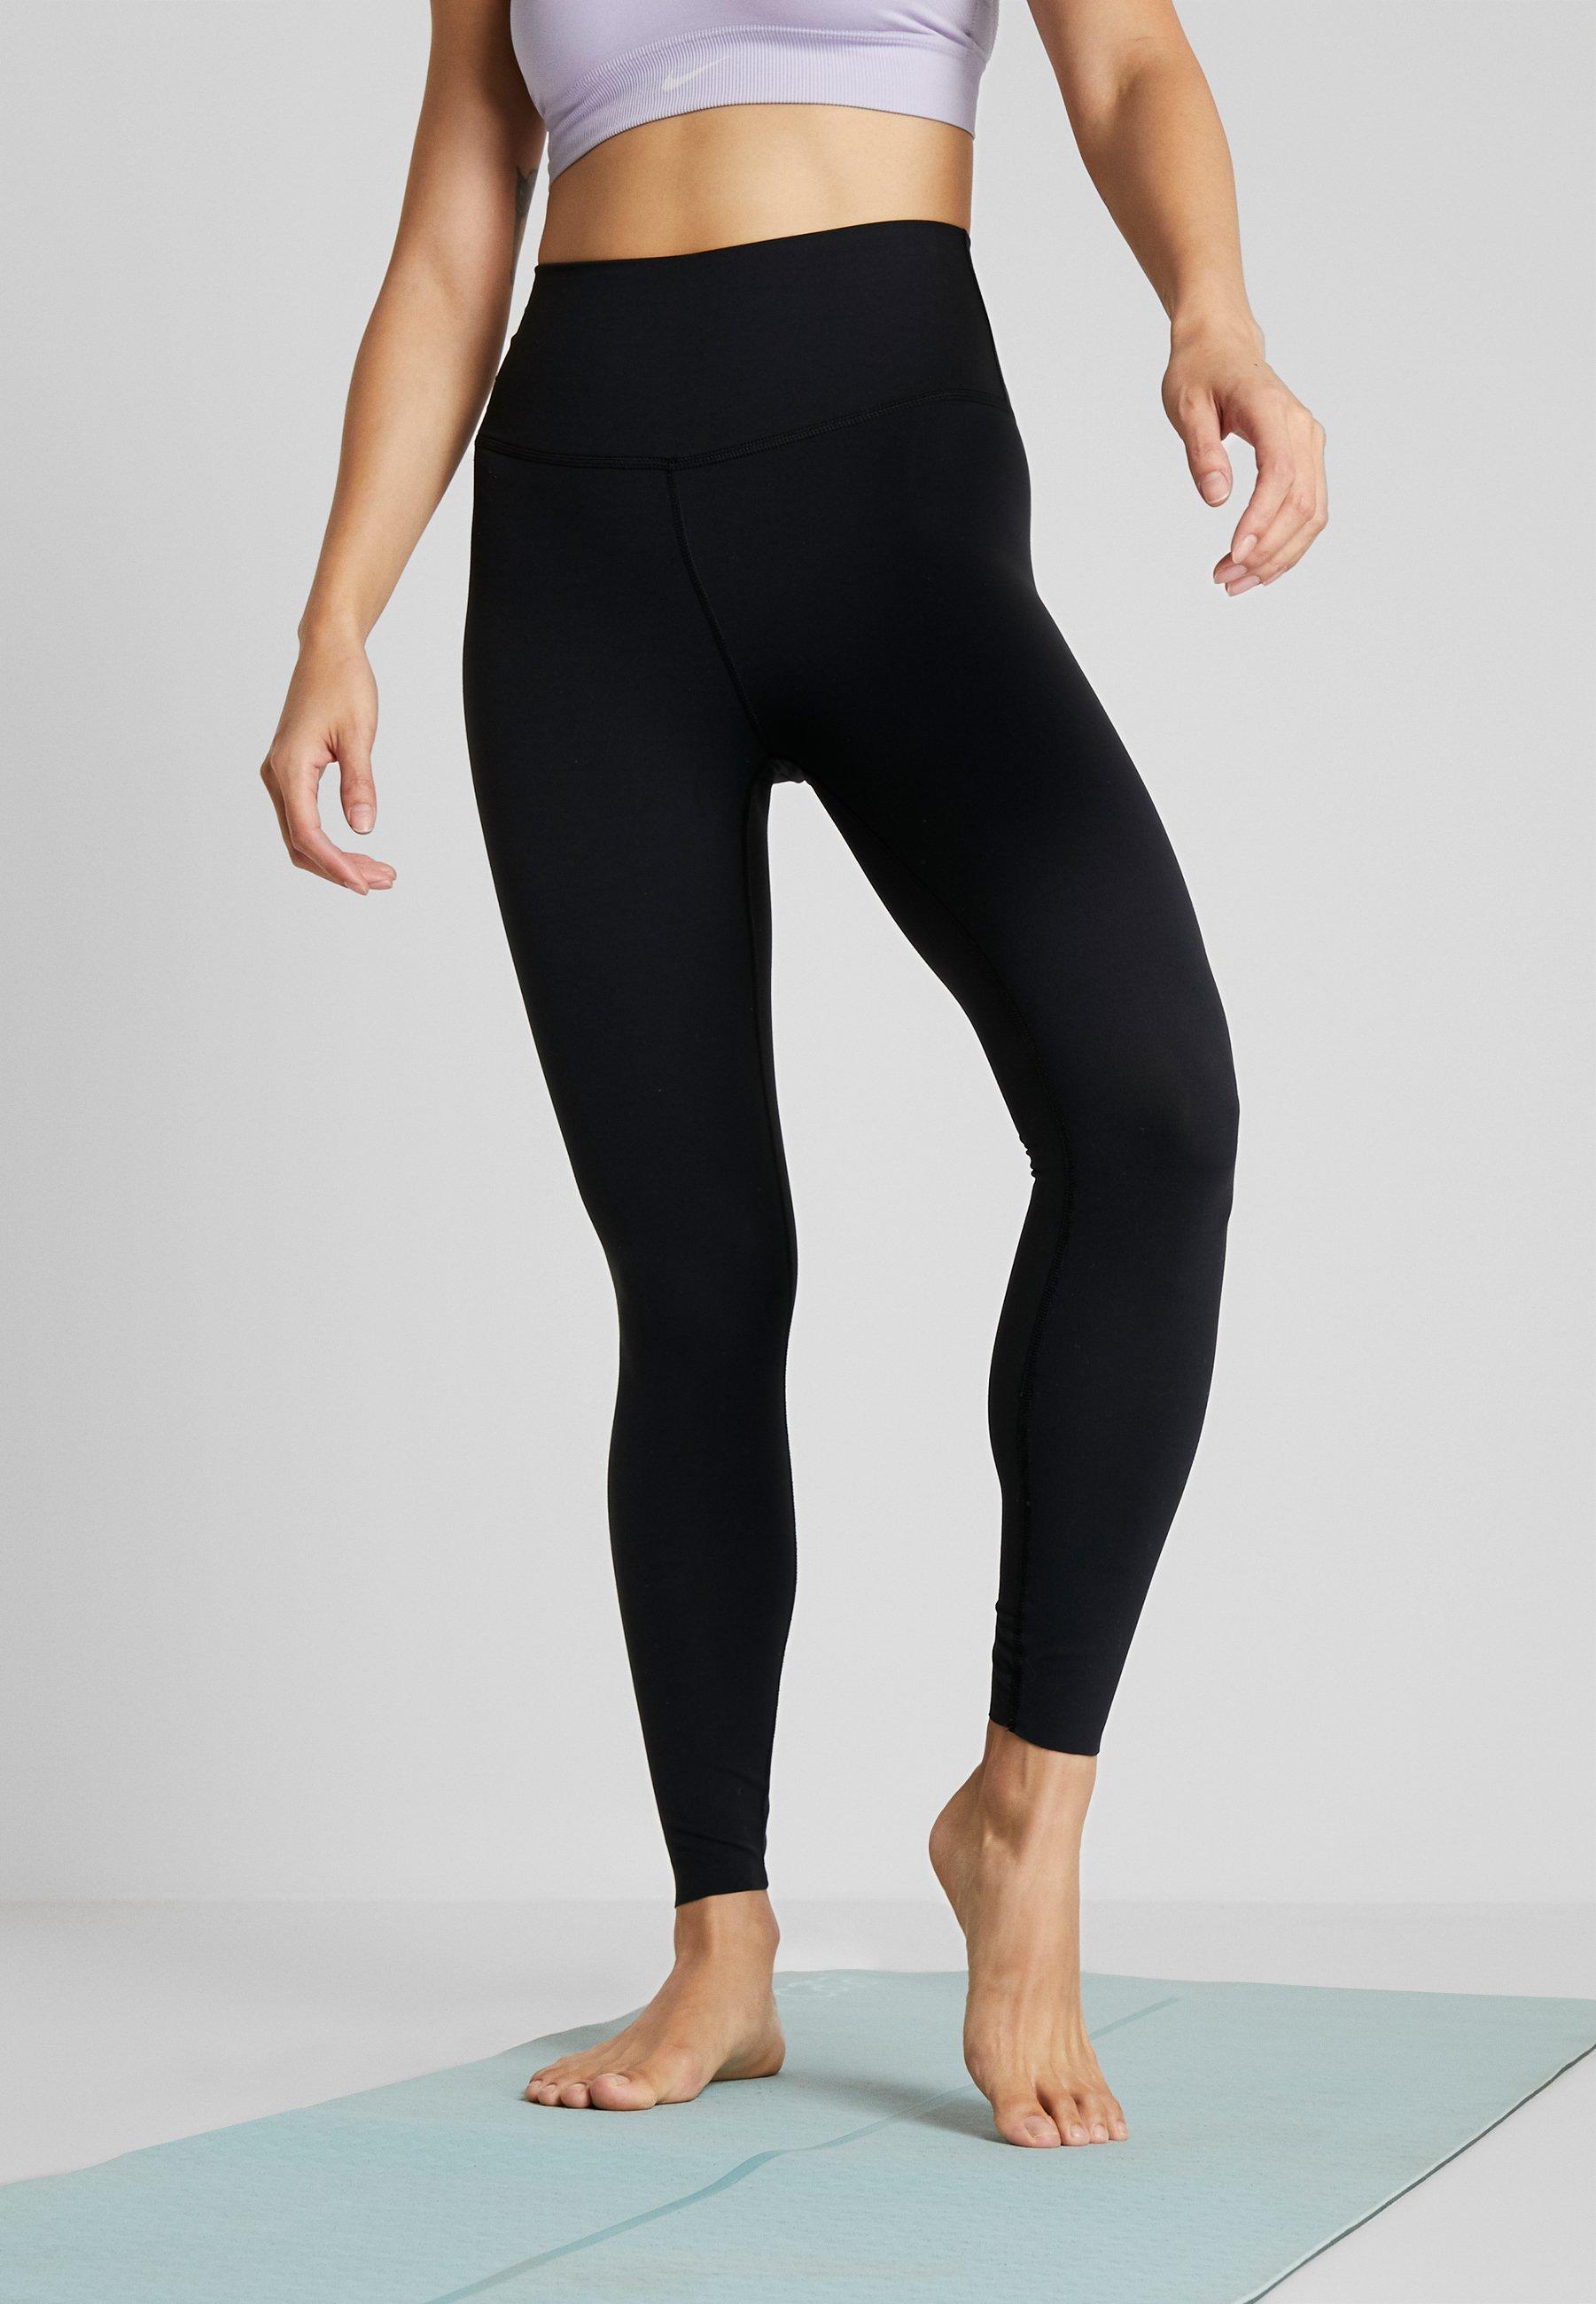 mordaz Influyente En otras palabras  Nike Performance THE NIKE YOGA LUXE 7/8 - Leggings - black/dark smoke  grey/black - Zalando.co.uk